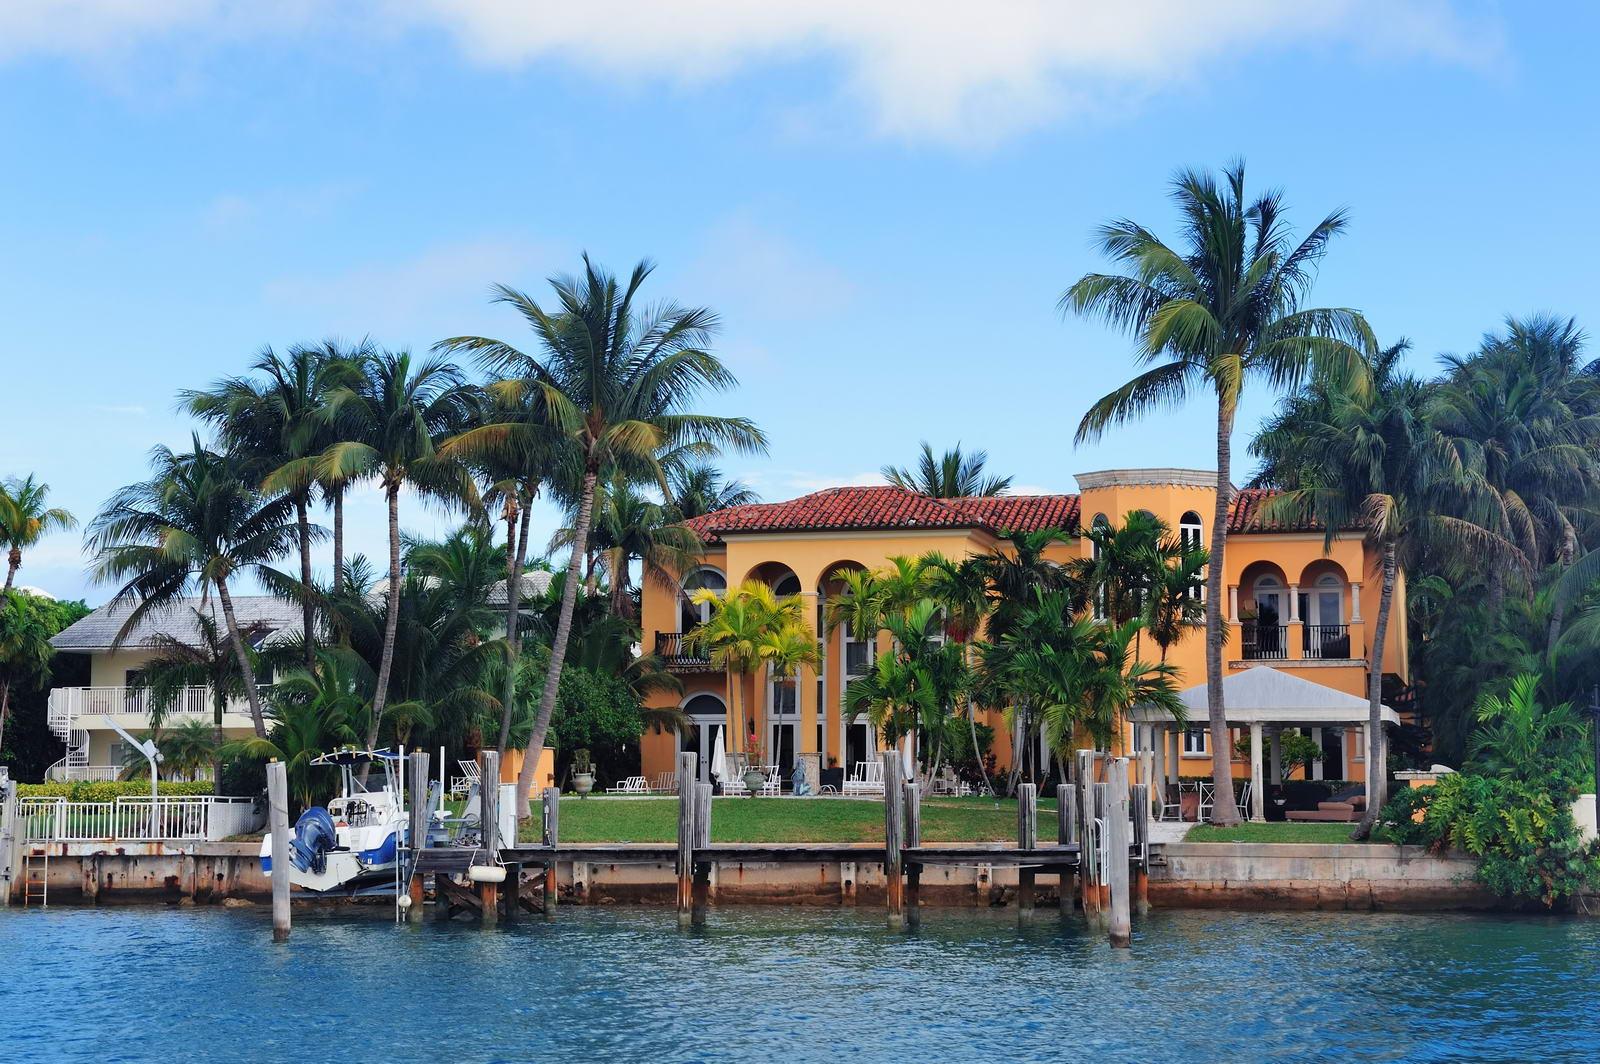 Louer une maison à Miami ou Miami Beach